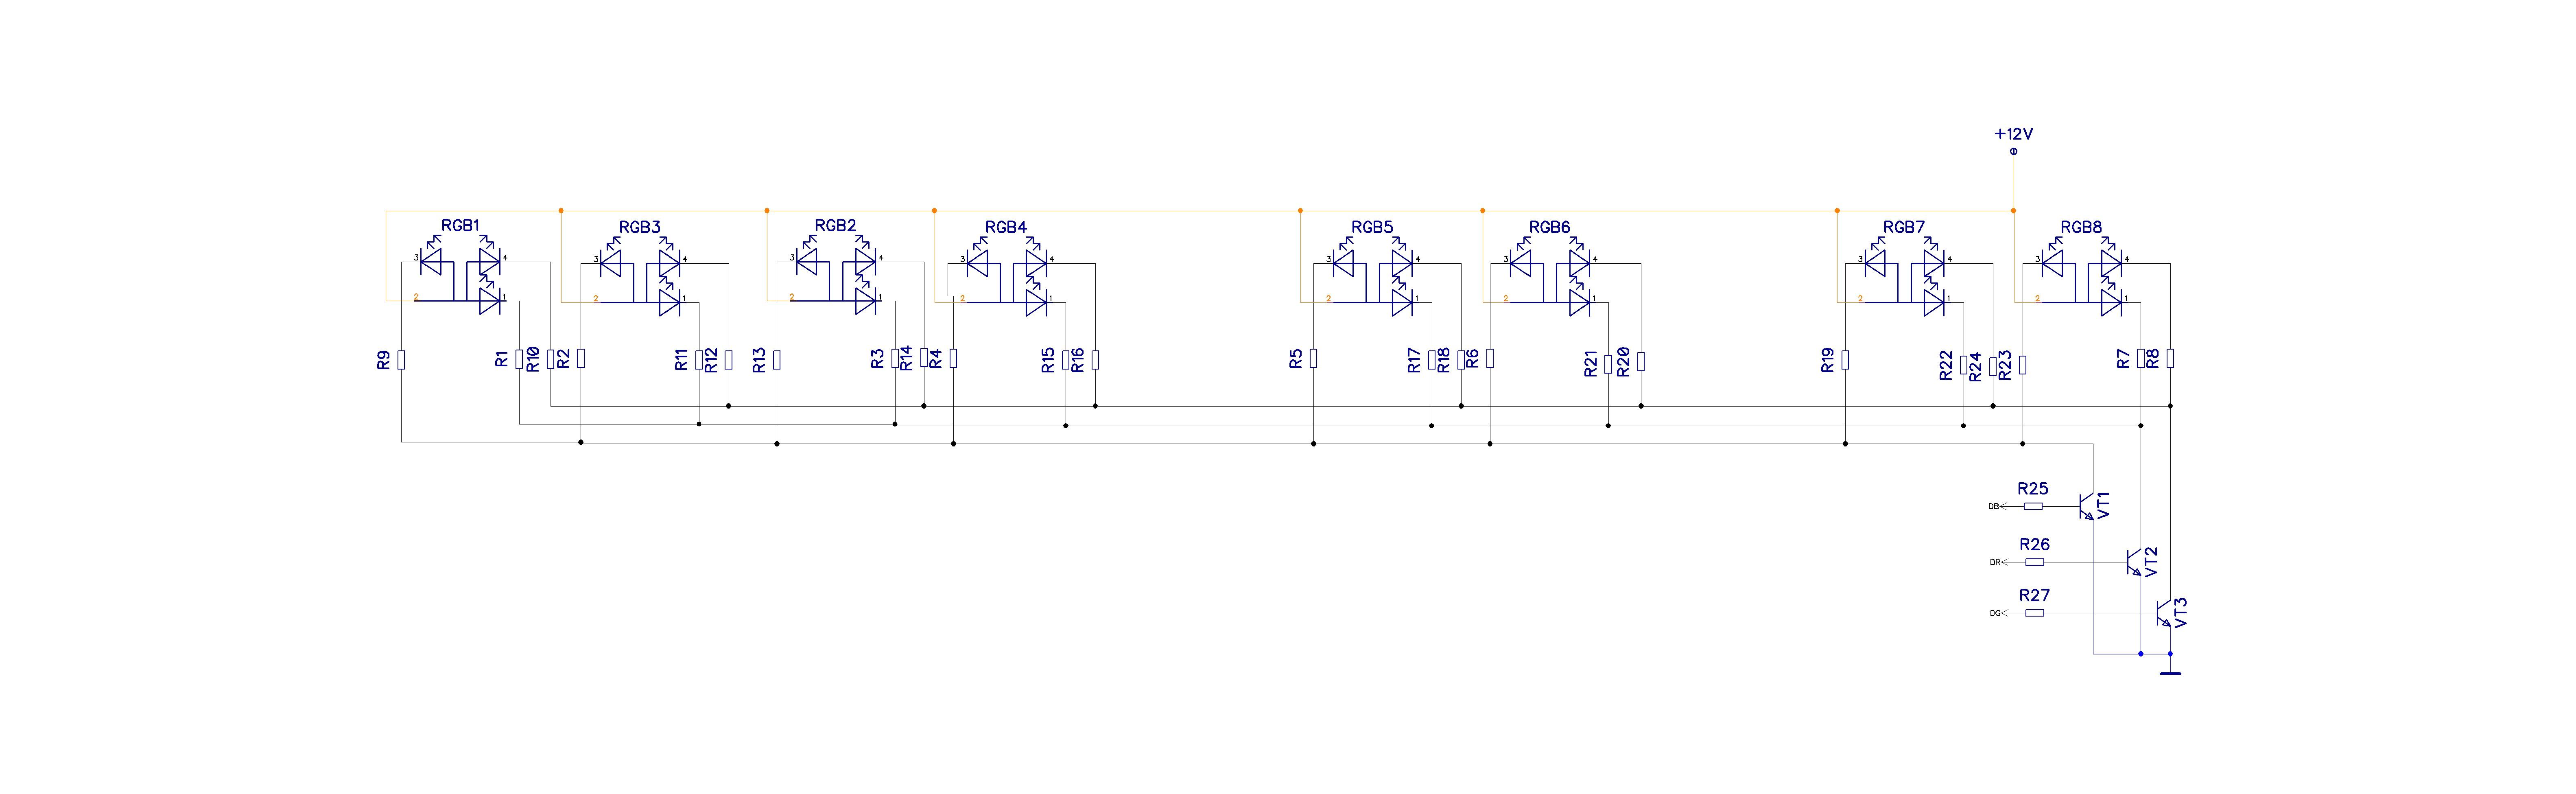 Схема Светодиоды.jpg